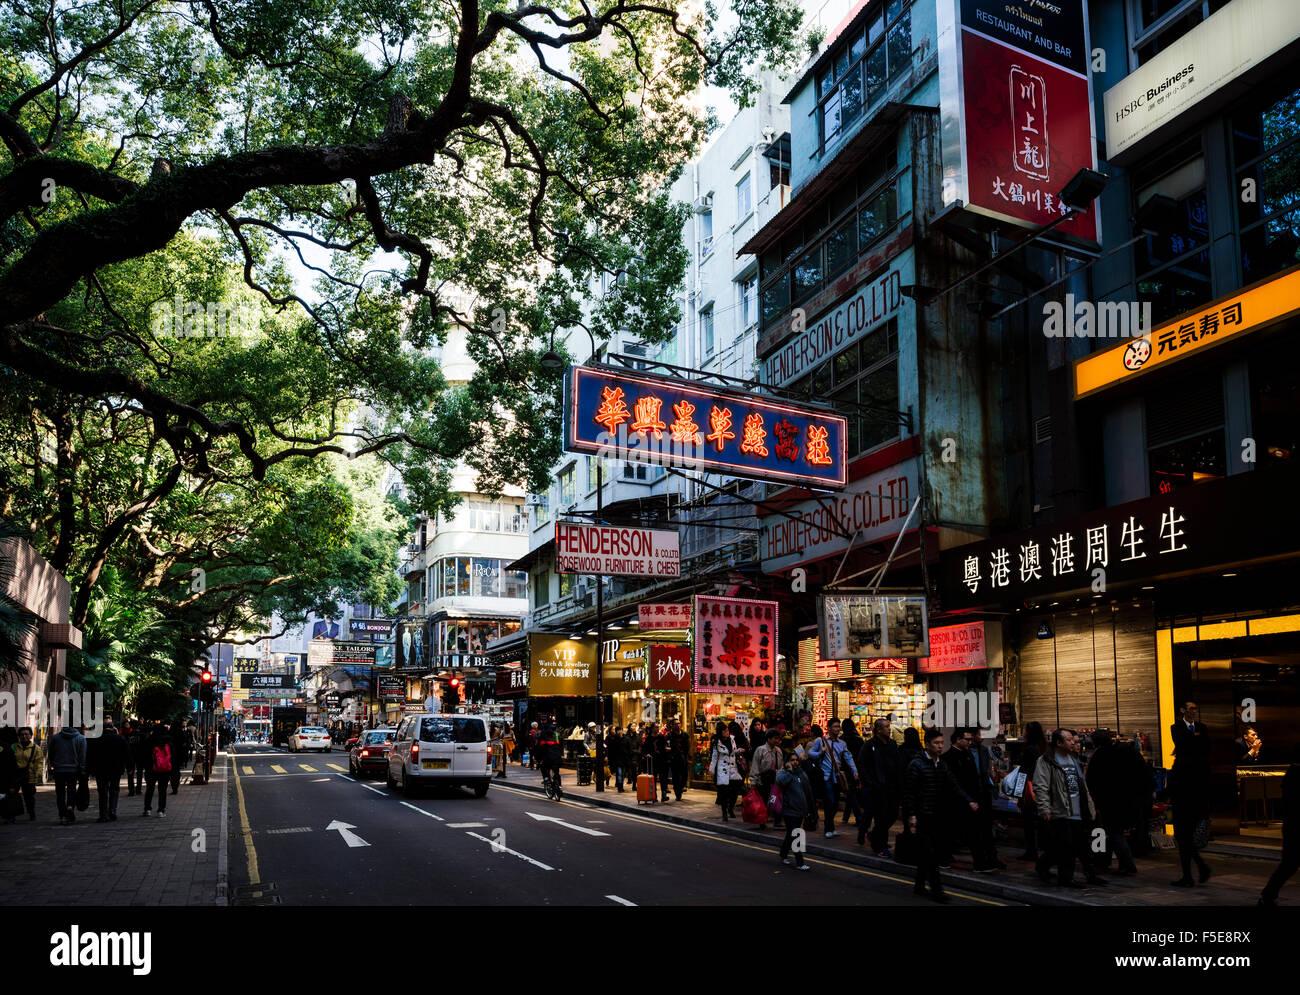 Street scene, Tsim Sha Tsui, Hong Kong, China, Asia - Stock Image